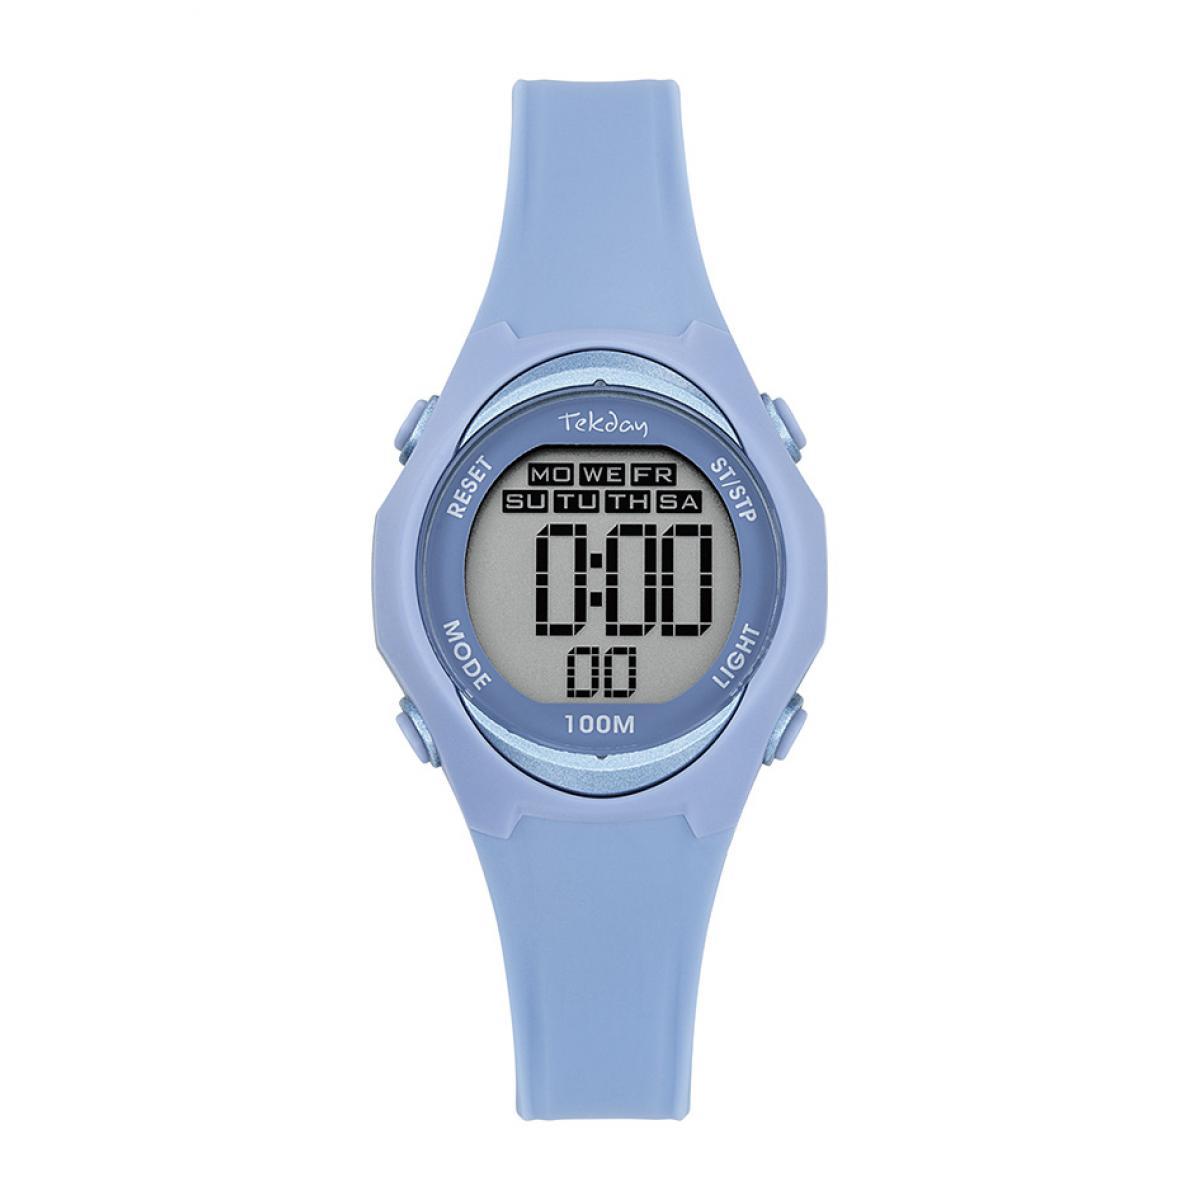 Montre 654669 - Bracelet Silicone Bleu Boitier Silicone Bleu - Tekday - Modalova